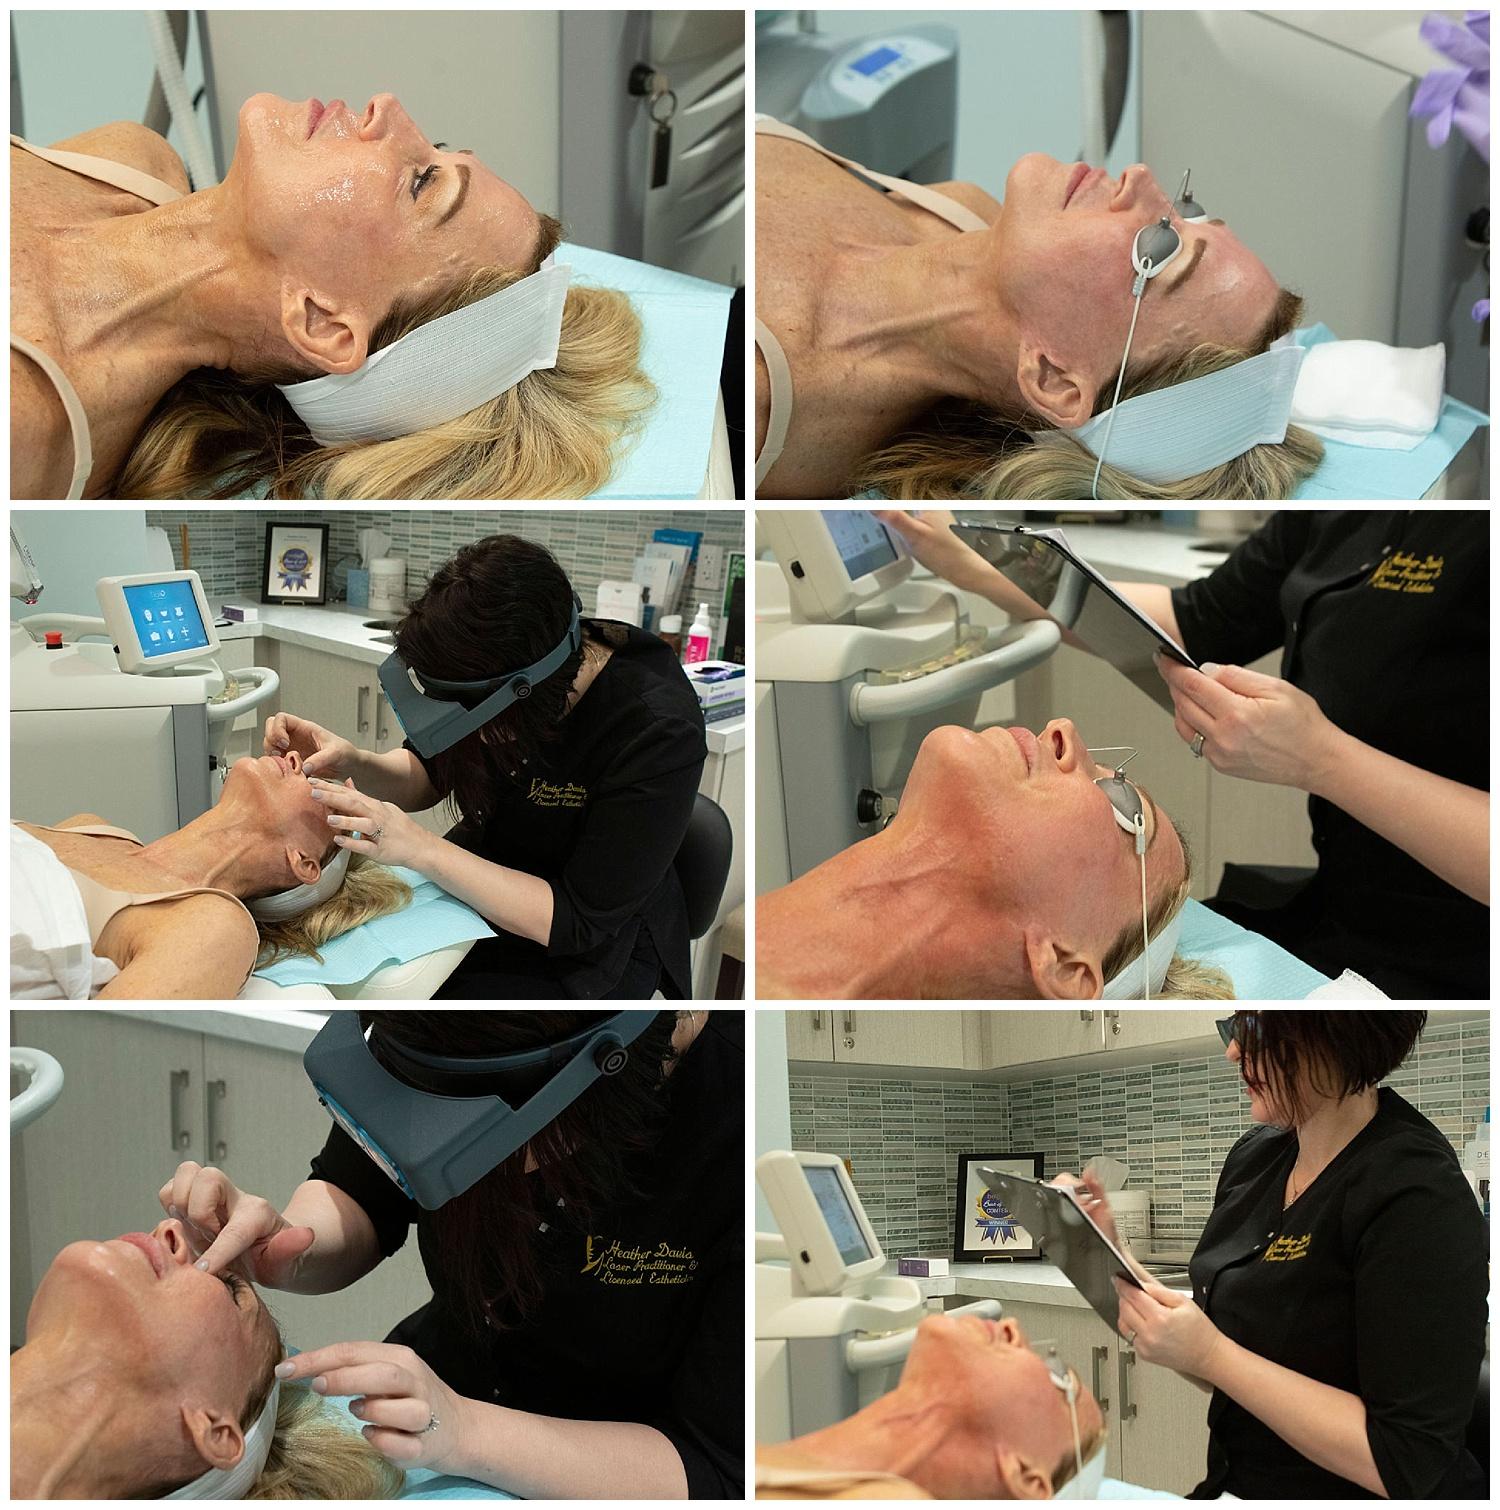 2019-04-02_0002.jpgHalo Laser Facial Treatment - Crazy Blonde Life